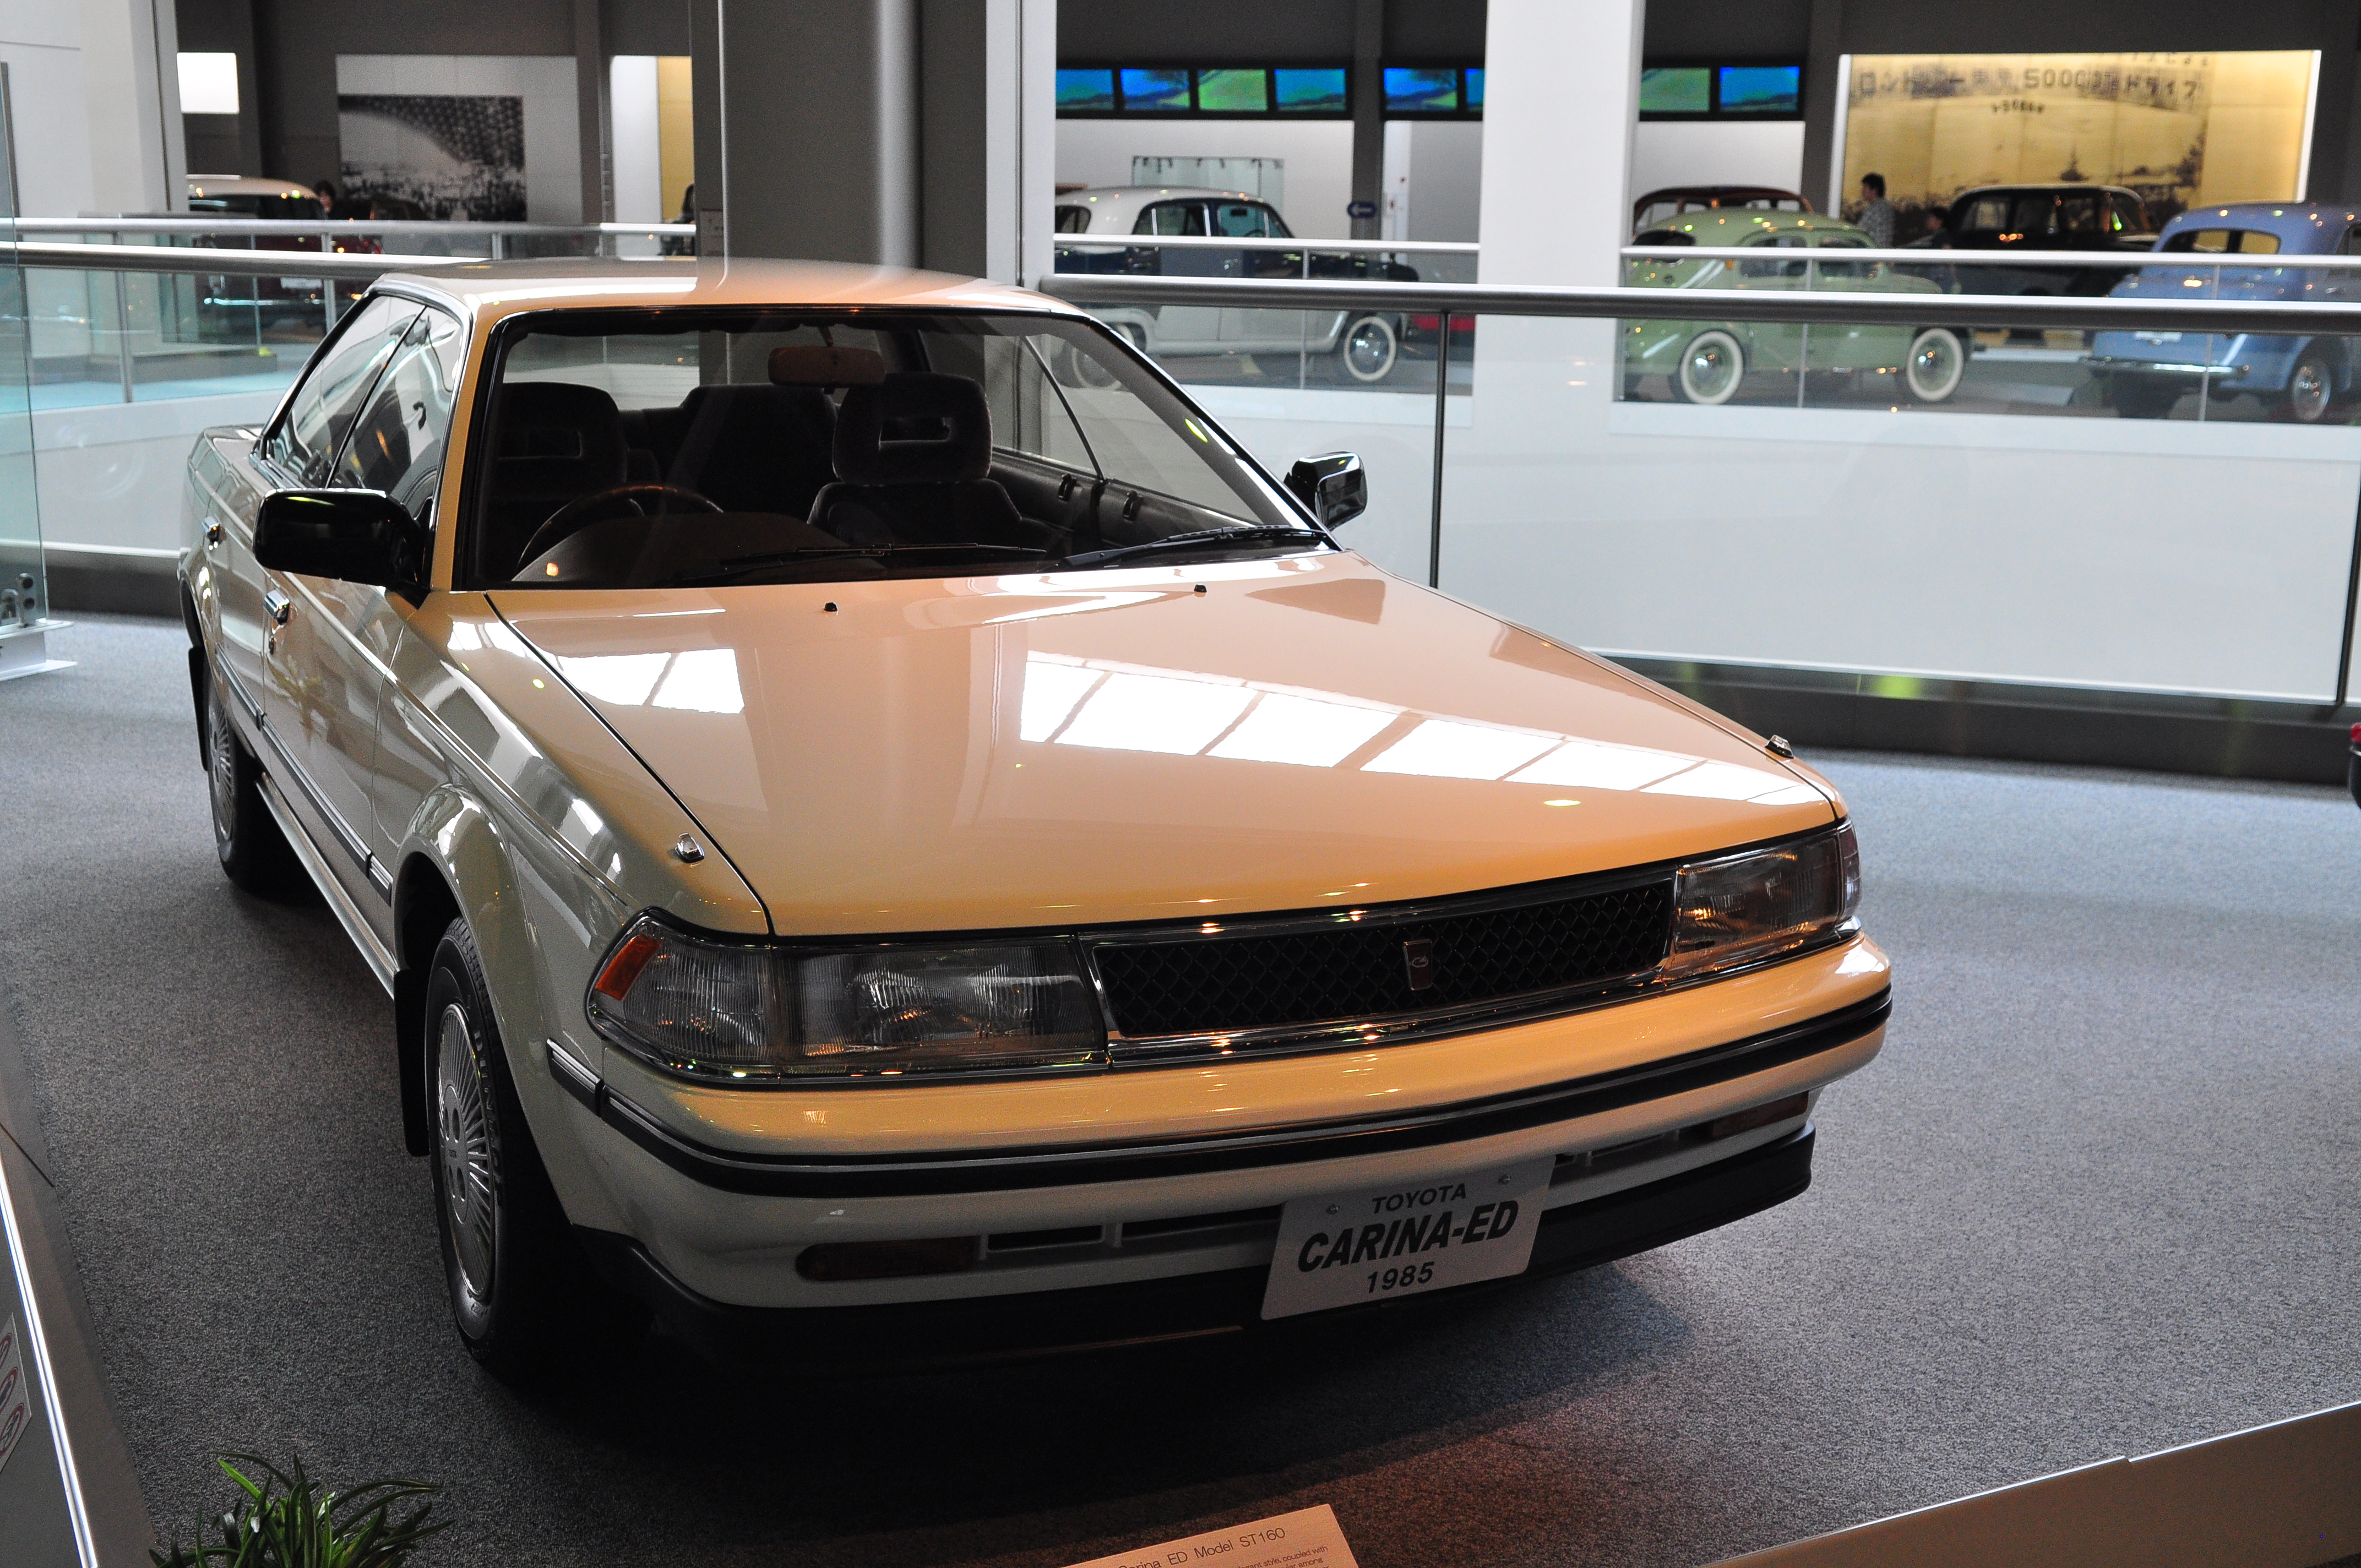 File Toyota Carina Ed 1 8 X St160 In Automobile Museum Jpg